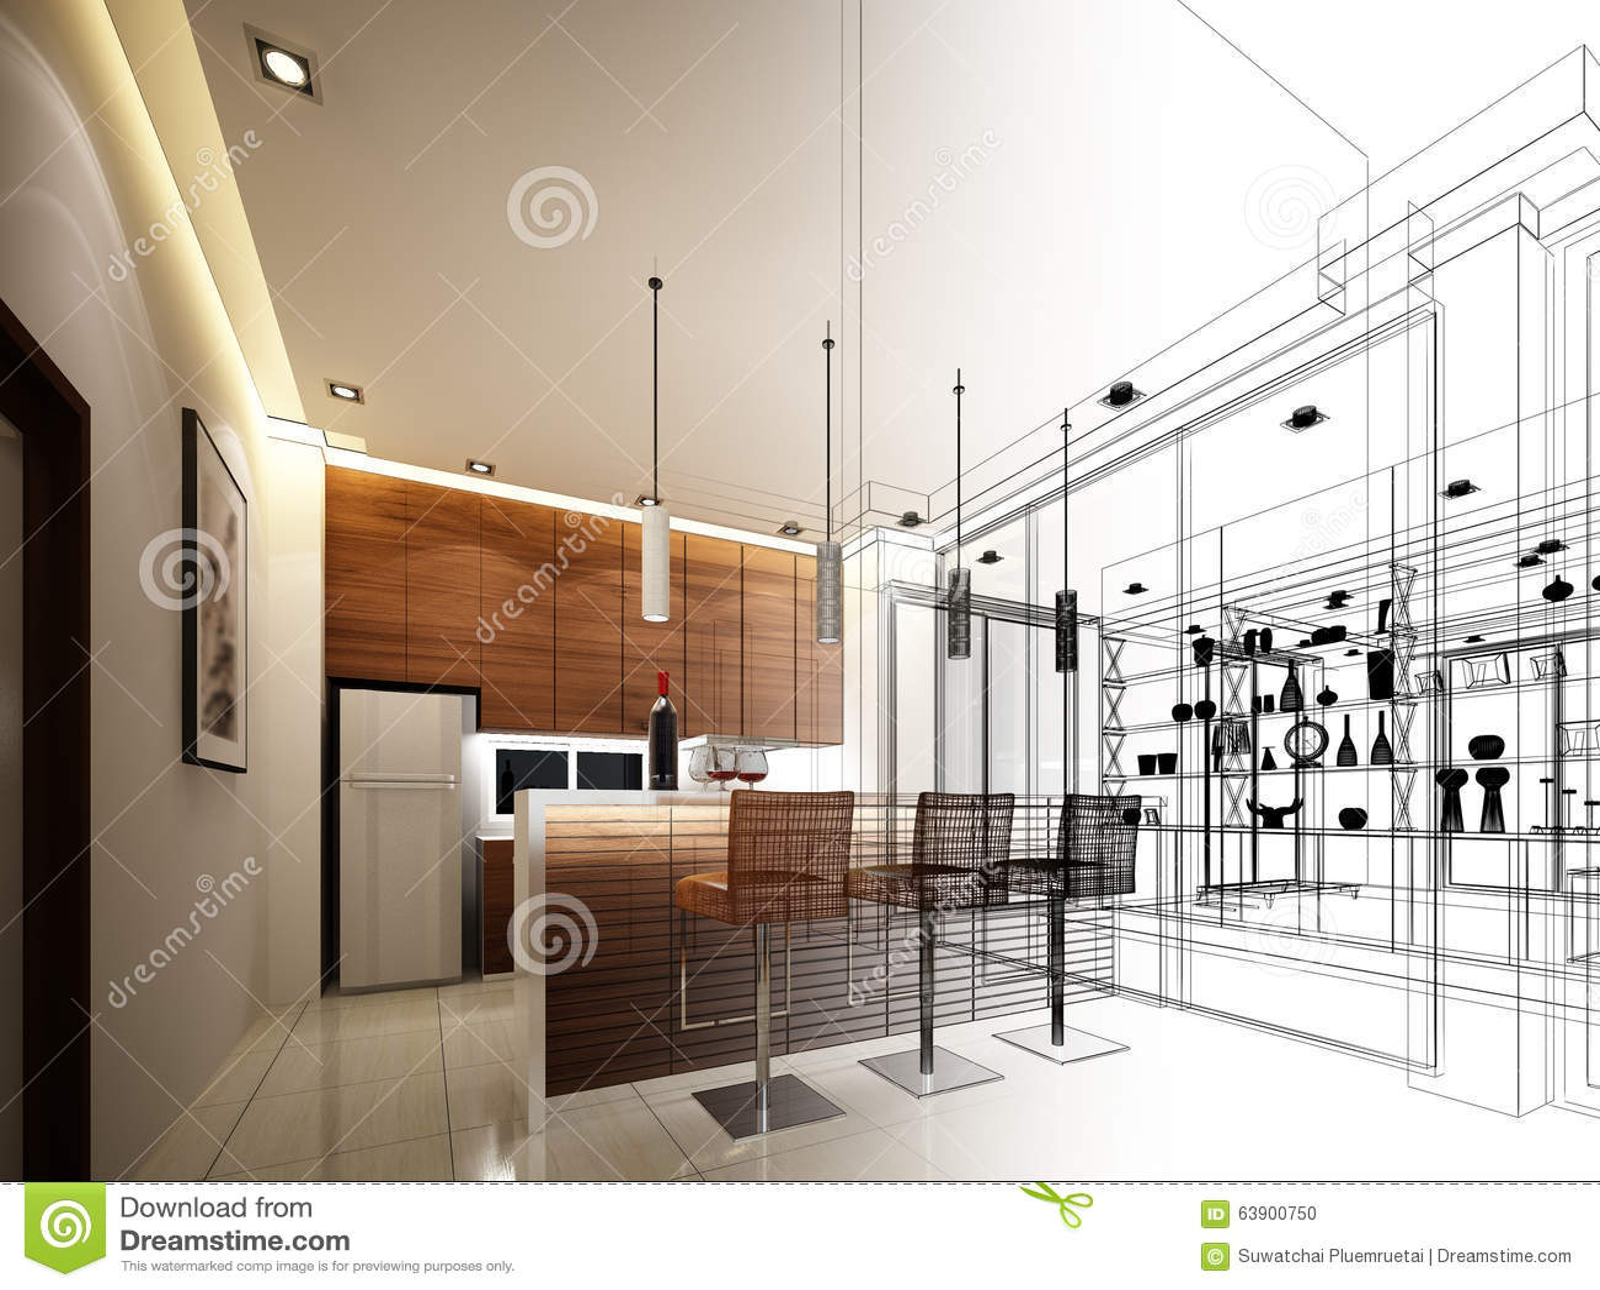 Abstract Sketch Design Of Interior Kitchen Stock Illustration - Illustration of modern